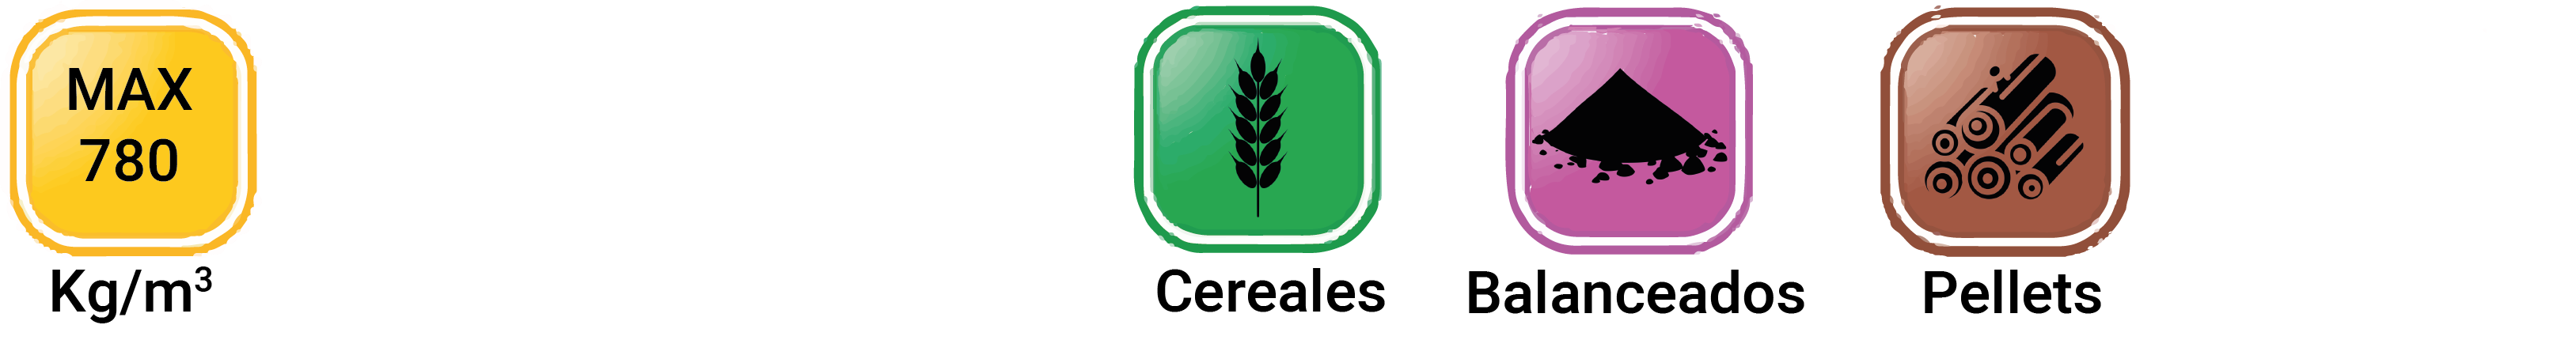 agrosilo rektangulær